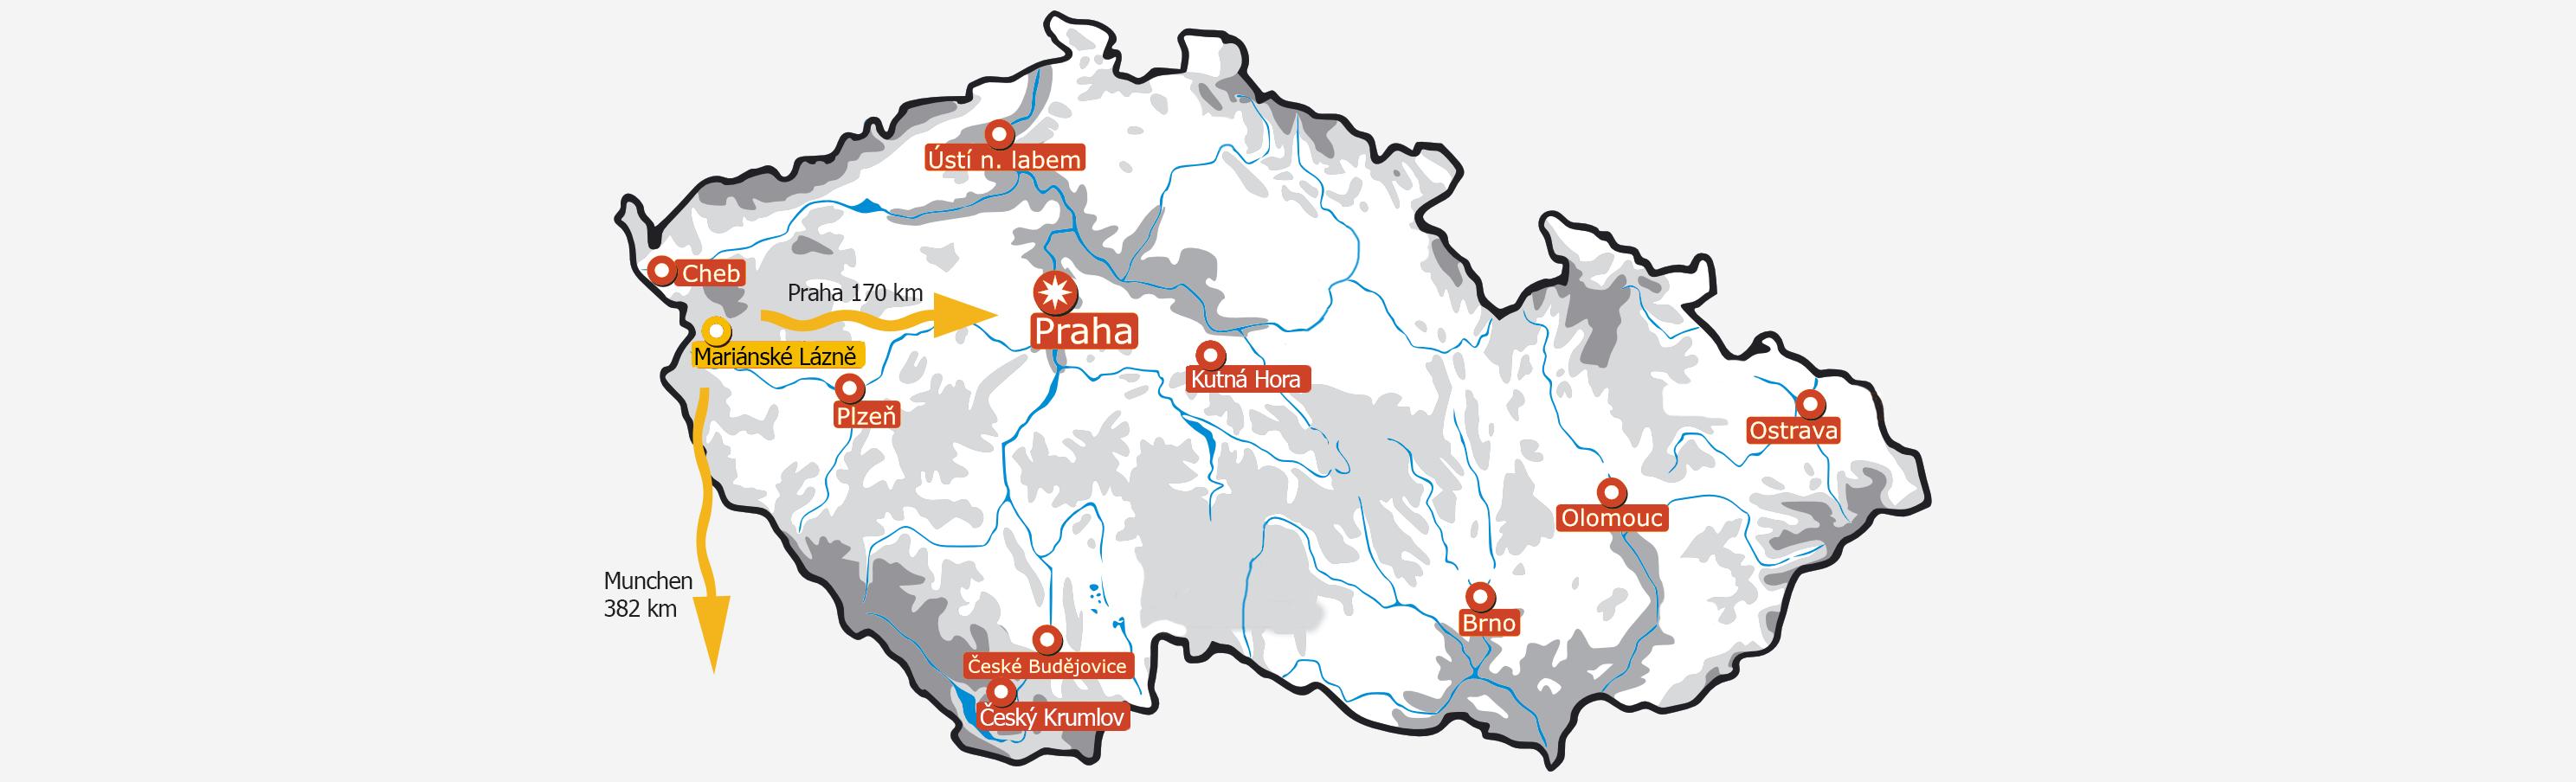 mapa_ceske_republiky bez mest